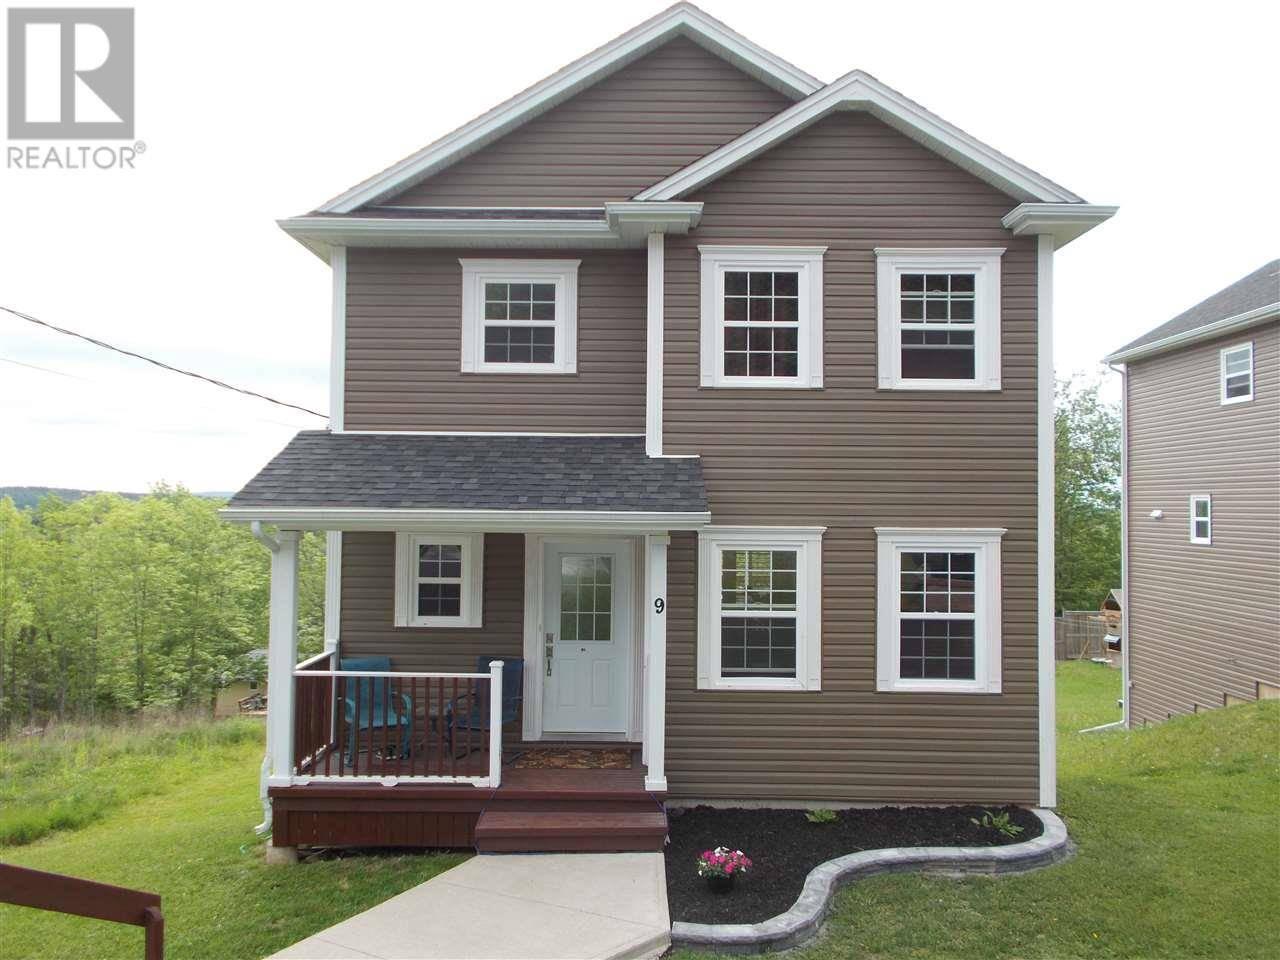 House for sale at 9 Daisy Dr Beaver Bank Nova Scotia - MLS: 201913265